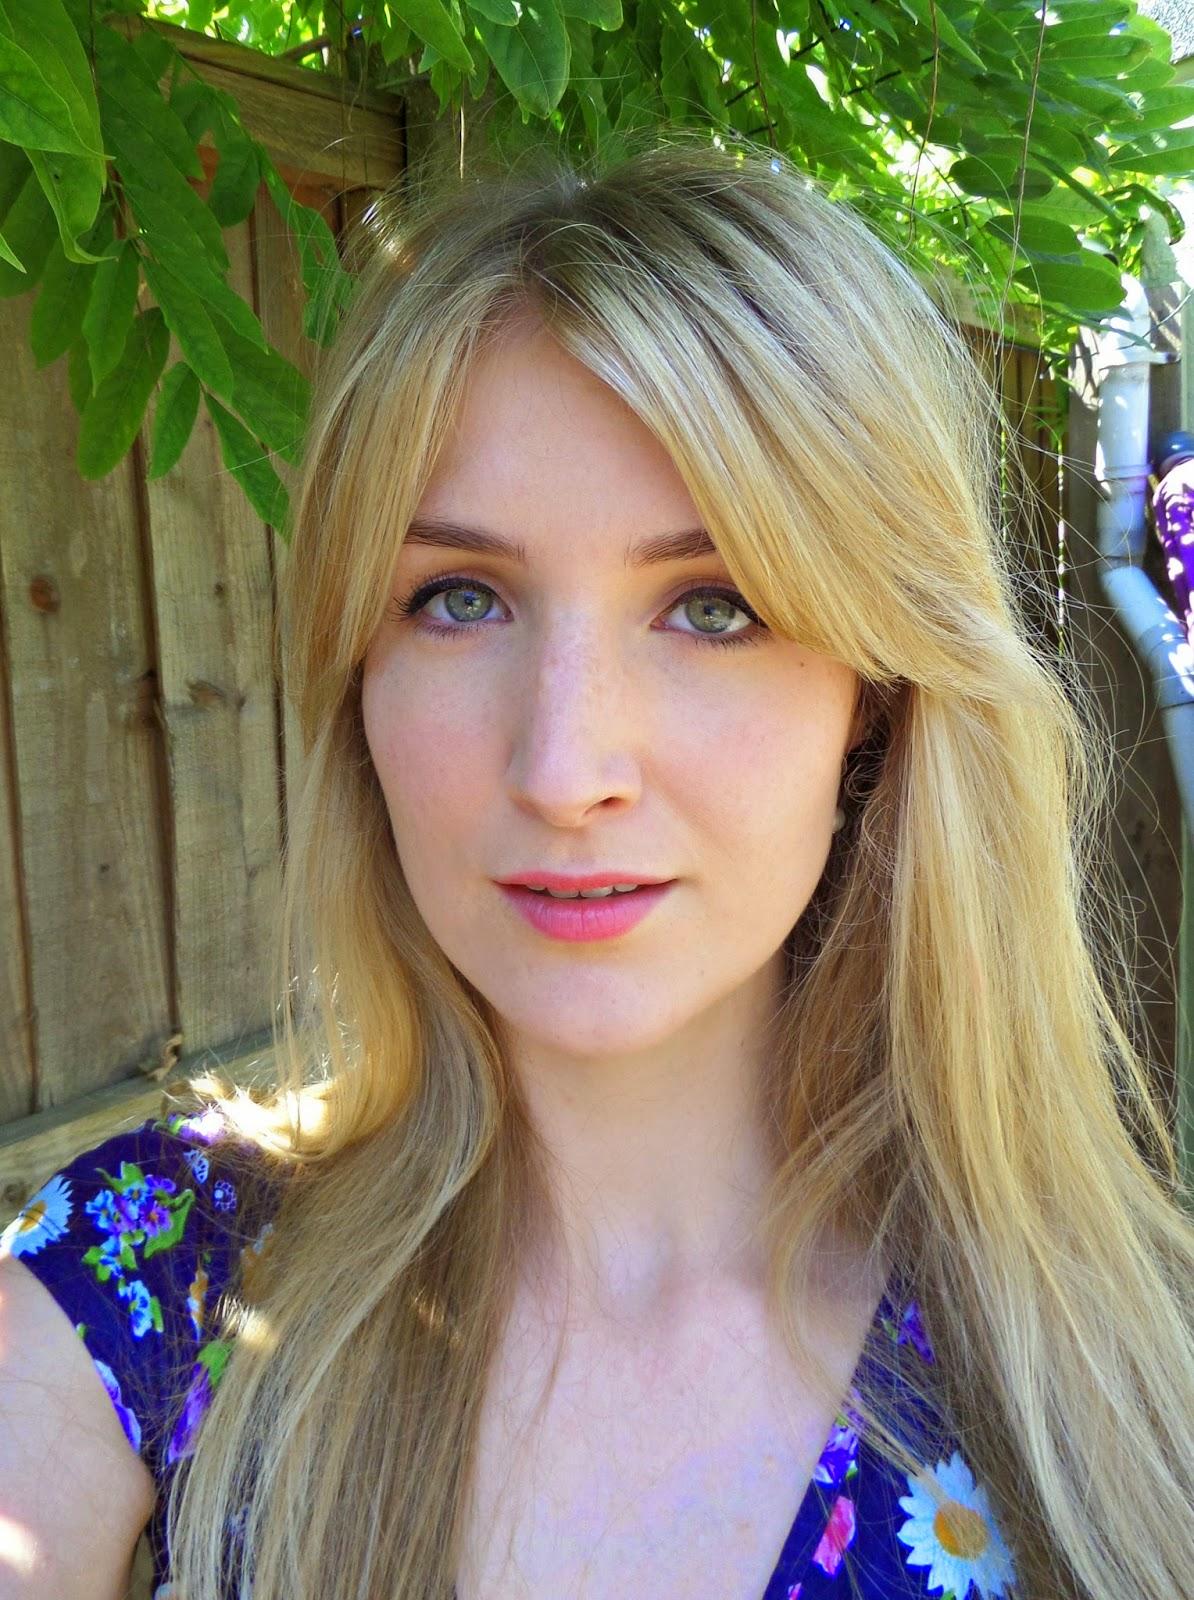 Laurenlovesmakeup Xoxo Primark Pound Fashion Nails: Review: Clinique Stay-Matte Oil-Free Makeup Foundation